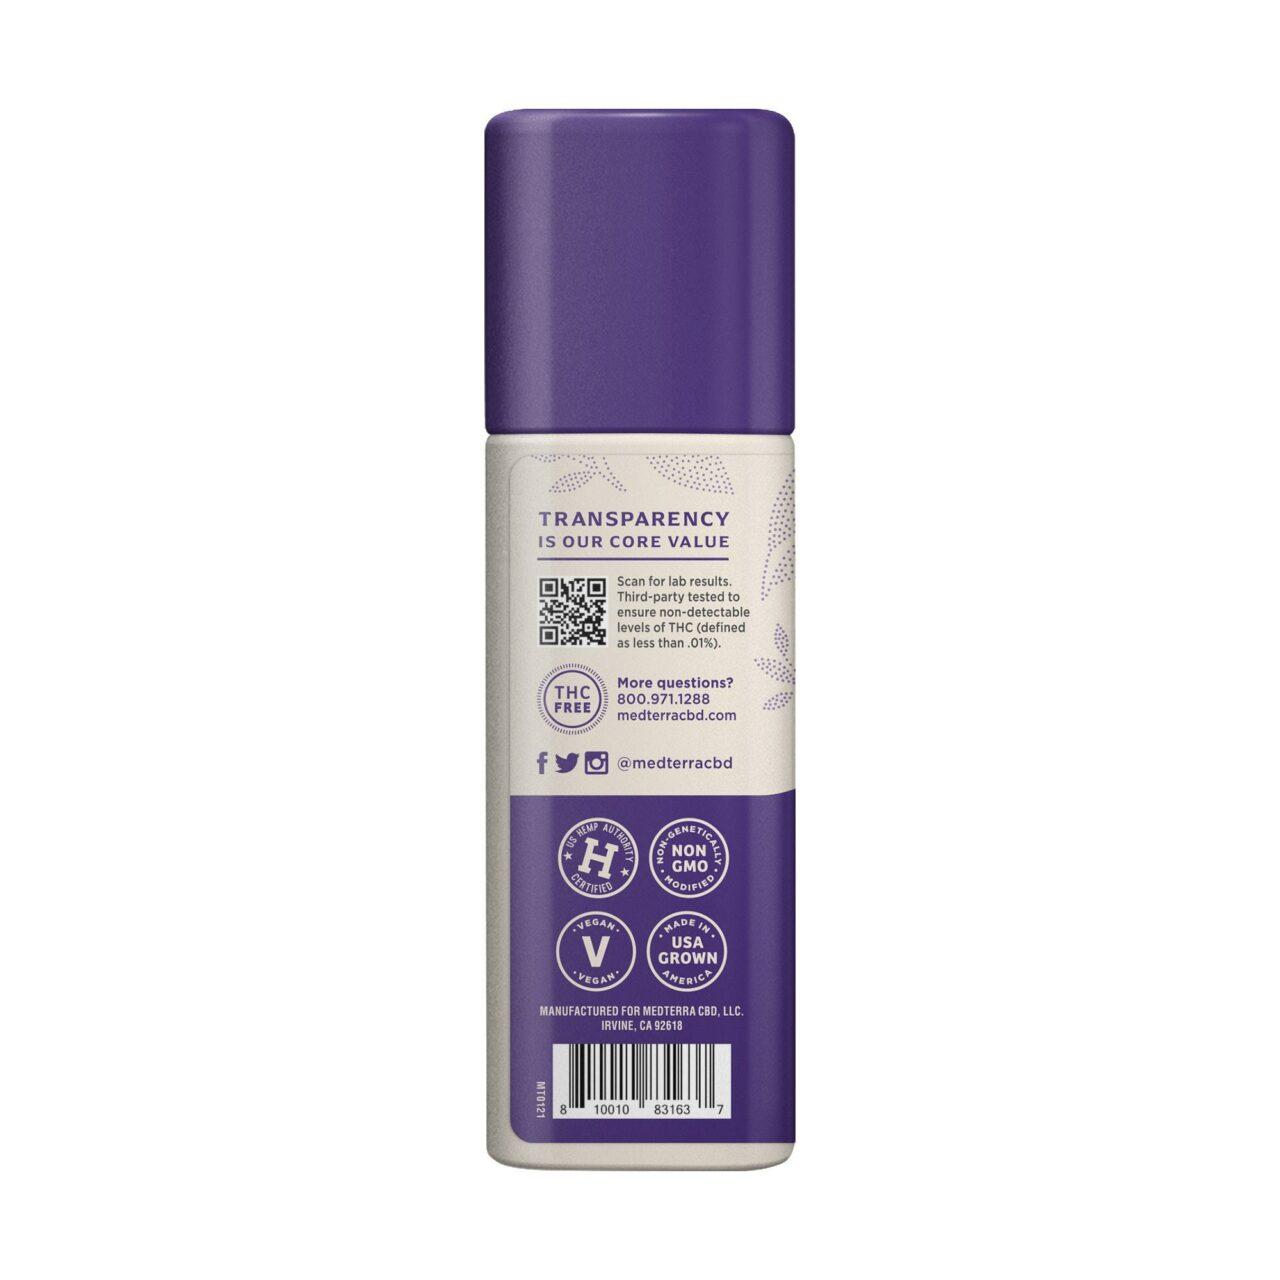 Medterra, Wellness Nature's Relief Daily CBD Cream, Broad Spectrum THC-Free, 1.7oz, 500mg CBD 3